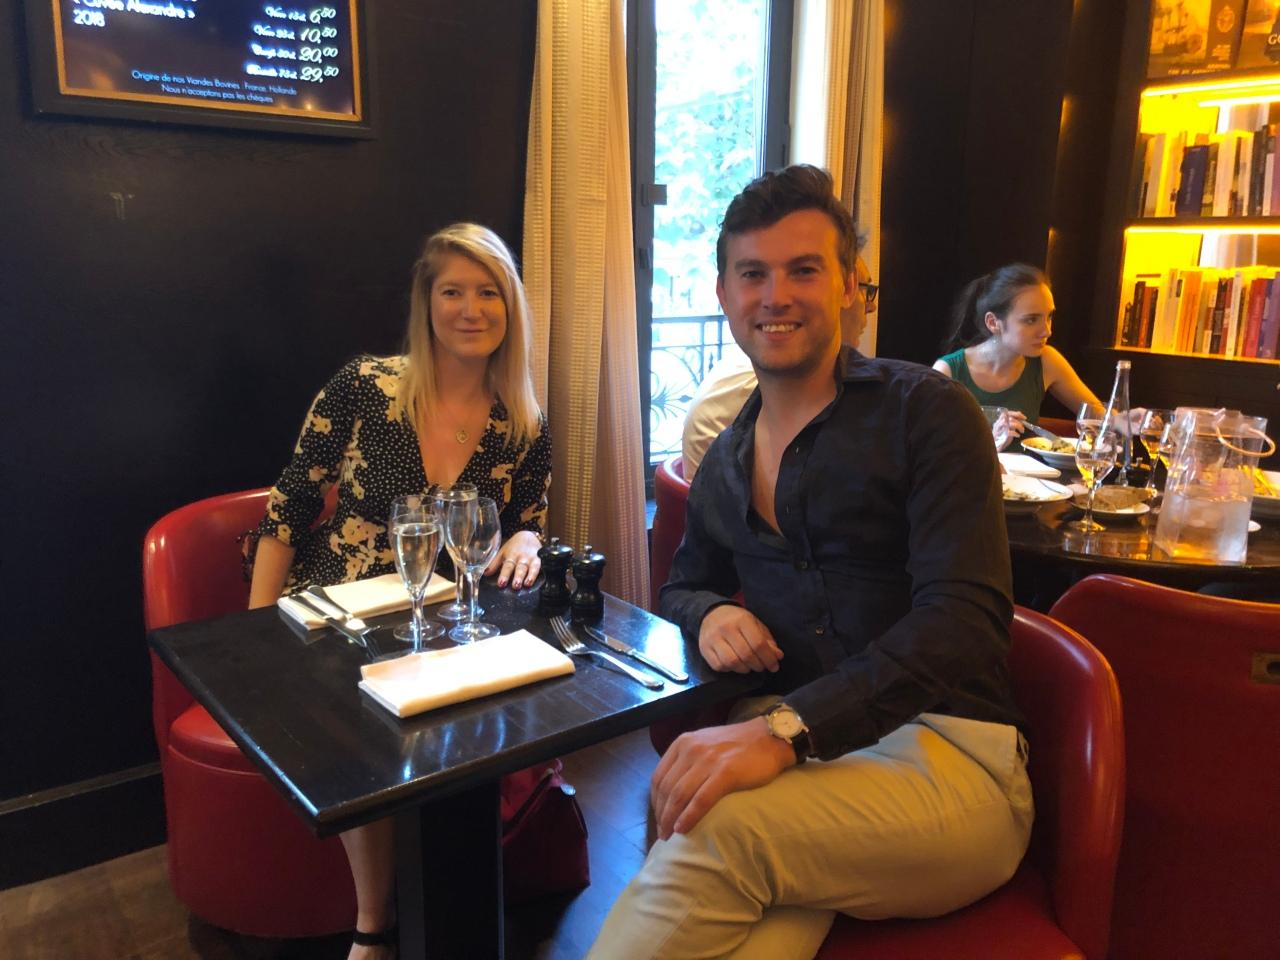 Dinner at Les Editeurs Paris